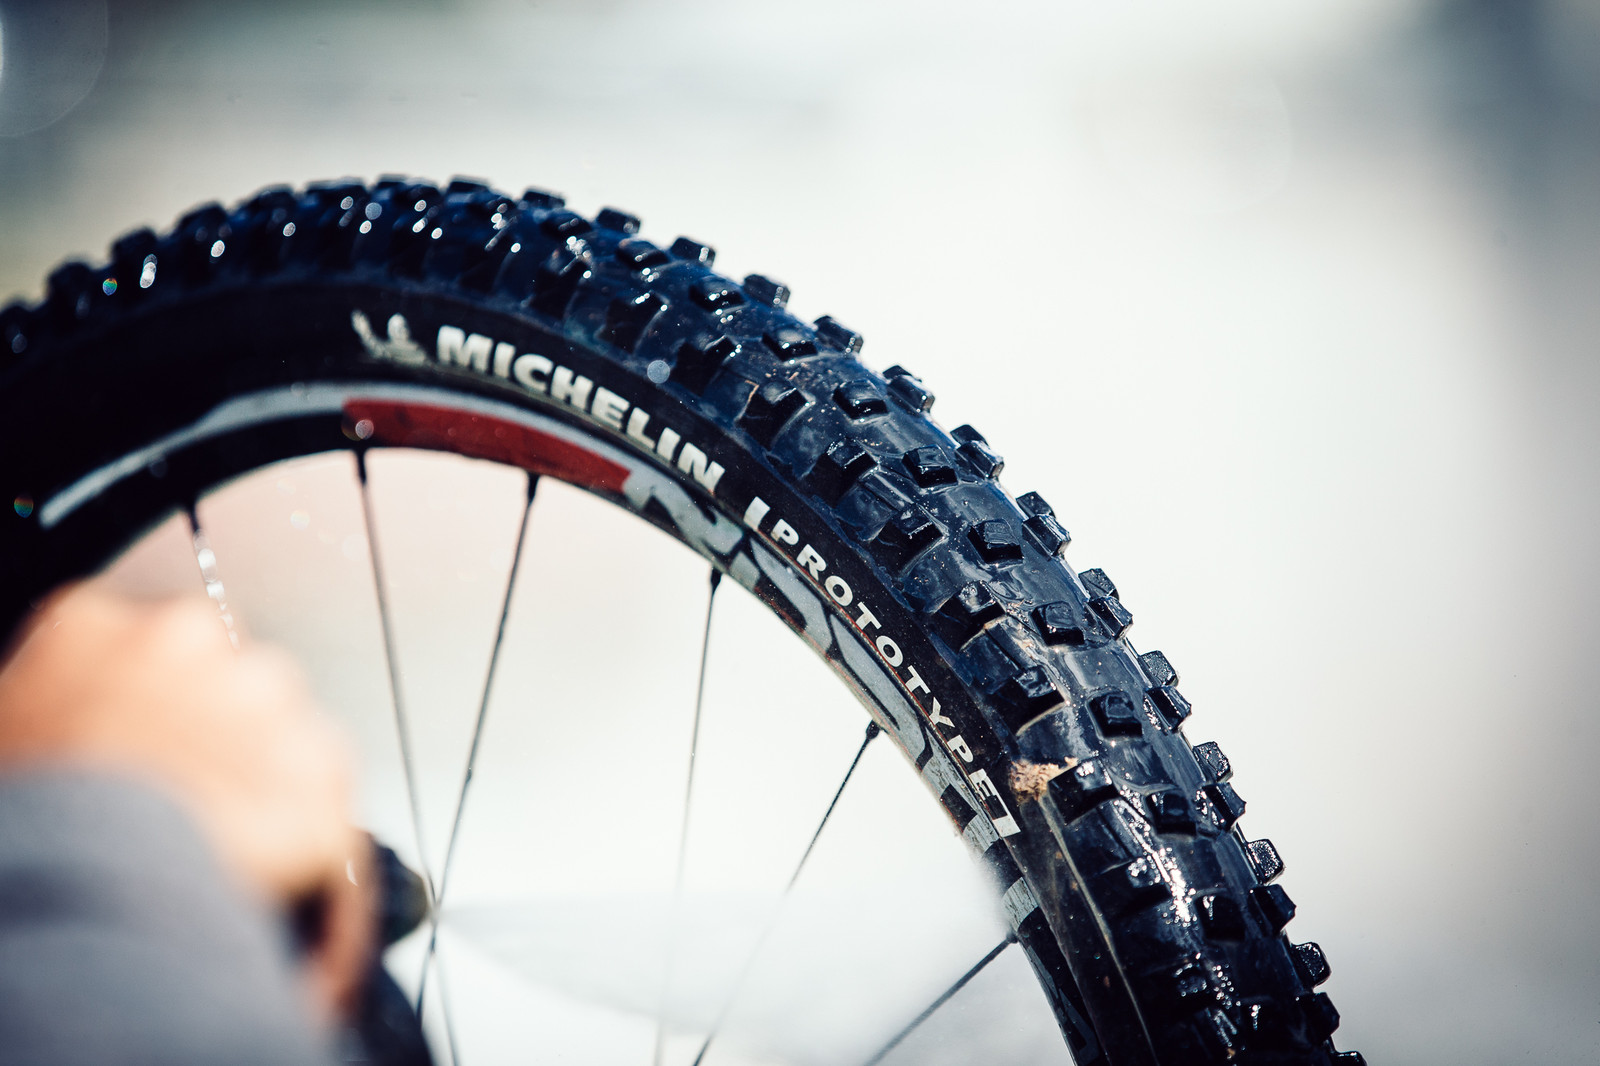 Jerome Clementz's Prototype Michelin Spikes - PIT BITS - Enduro World Series, Valberg - Mountain Biking Pictures - Vital MTB